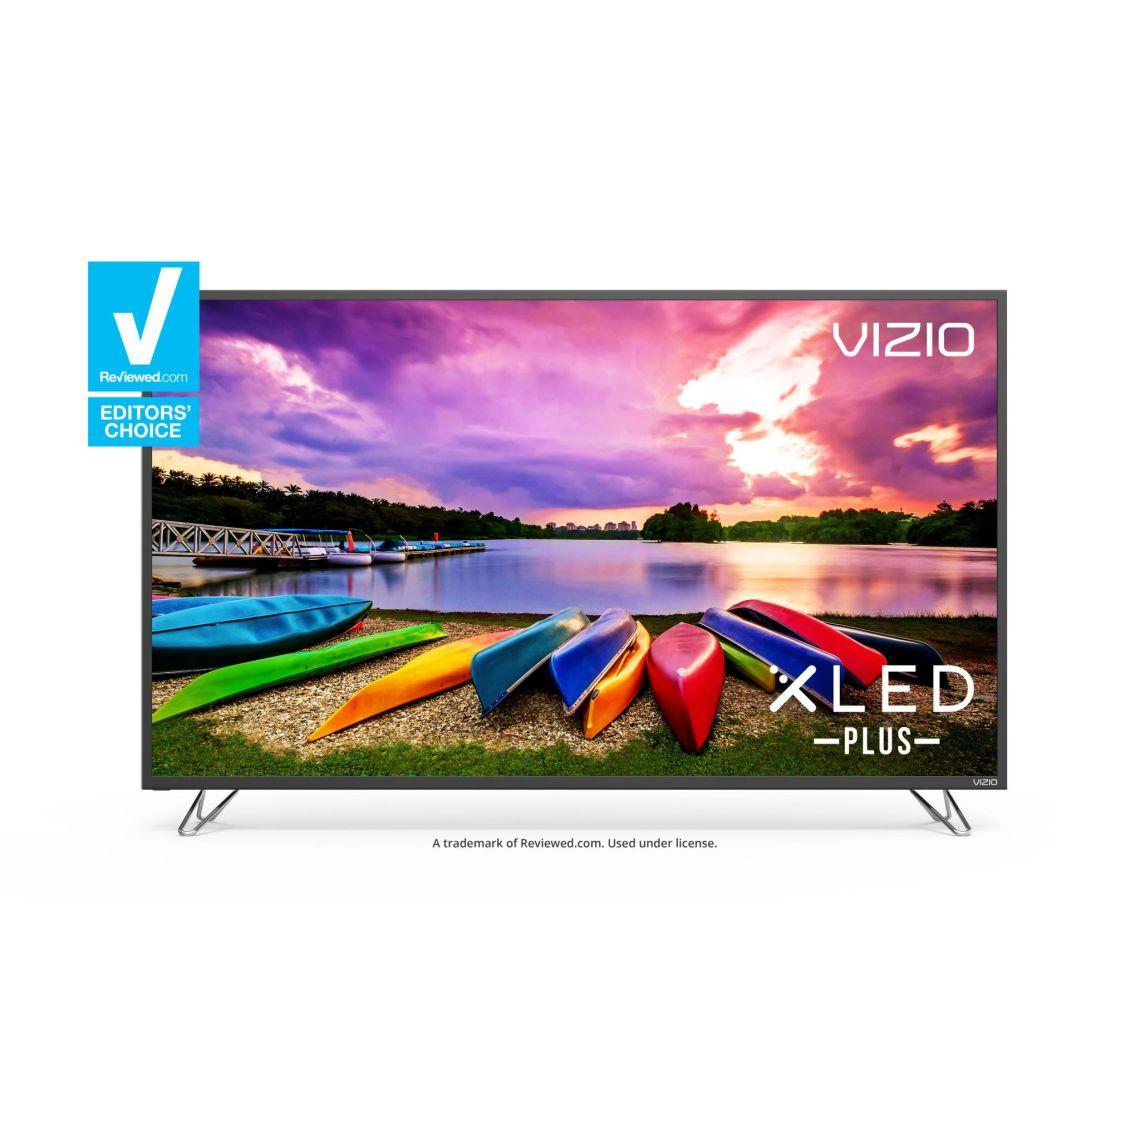 "VIZIO 75"" Class 4k (2160p) Smart XLED Home Theater Display (M75-E1) - Walmart.com"